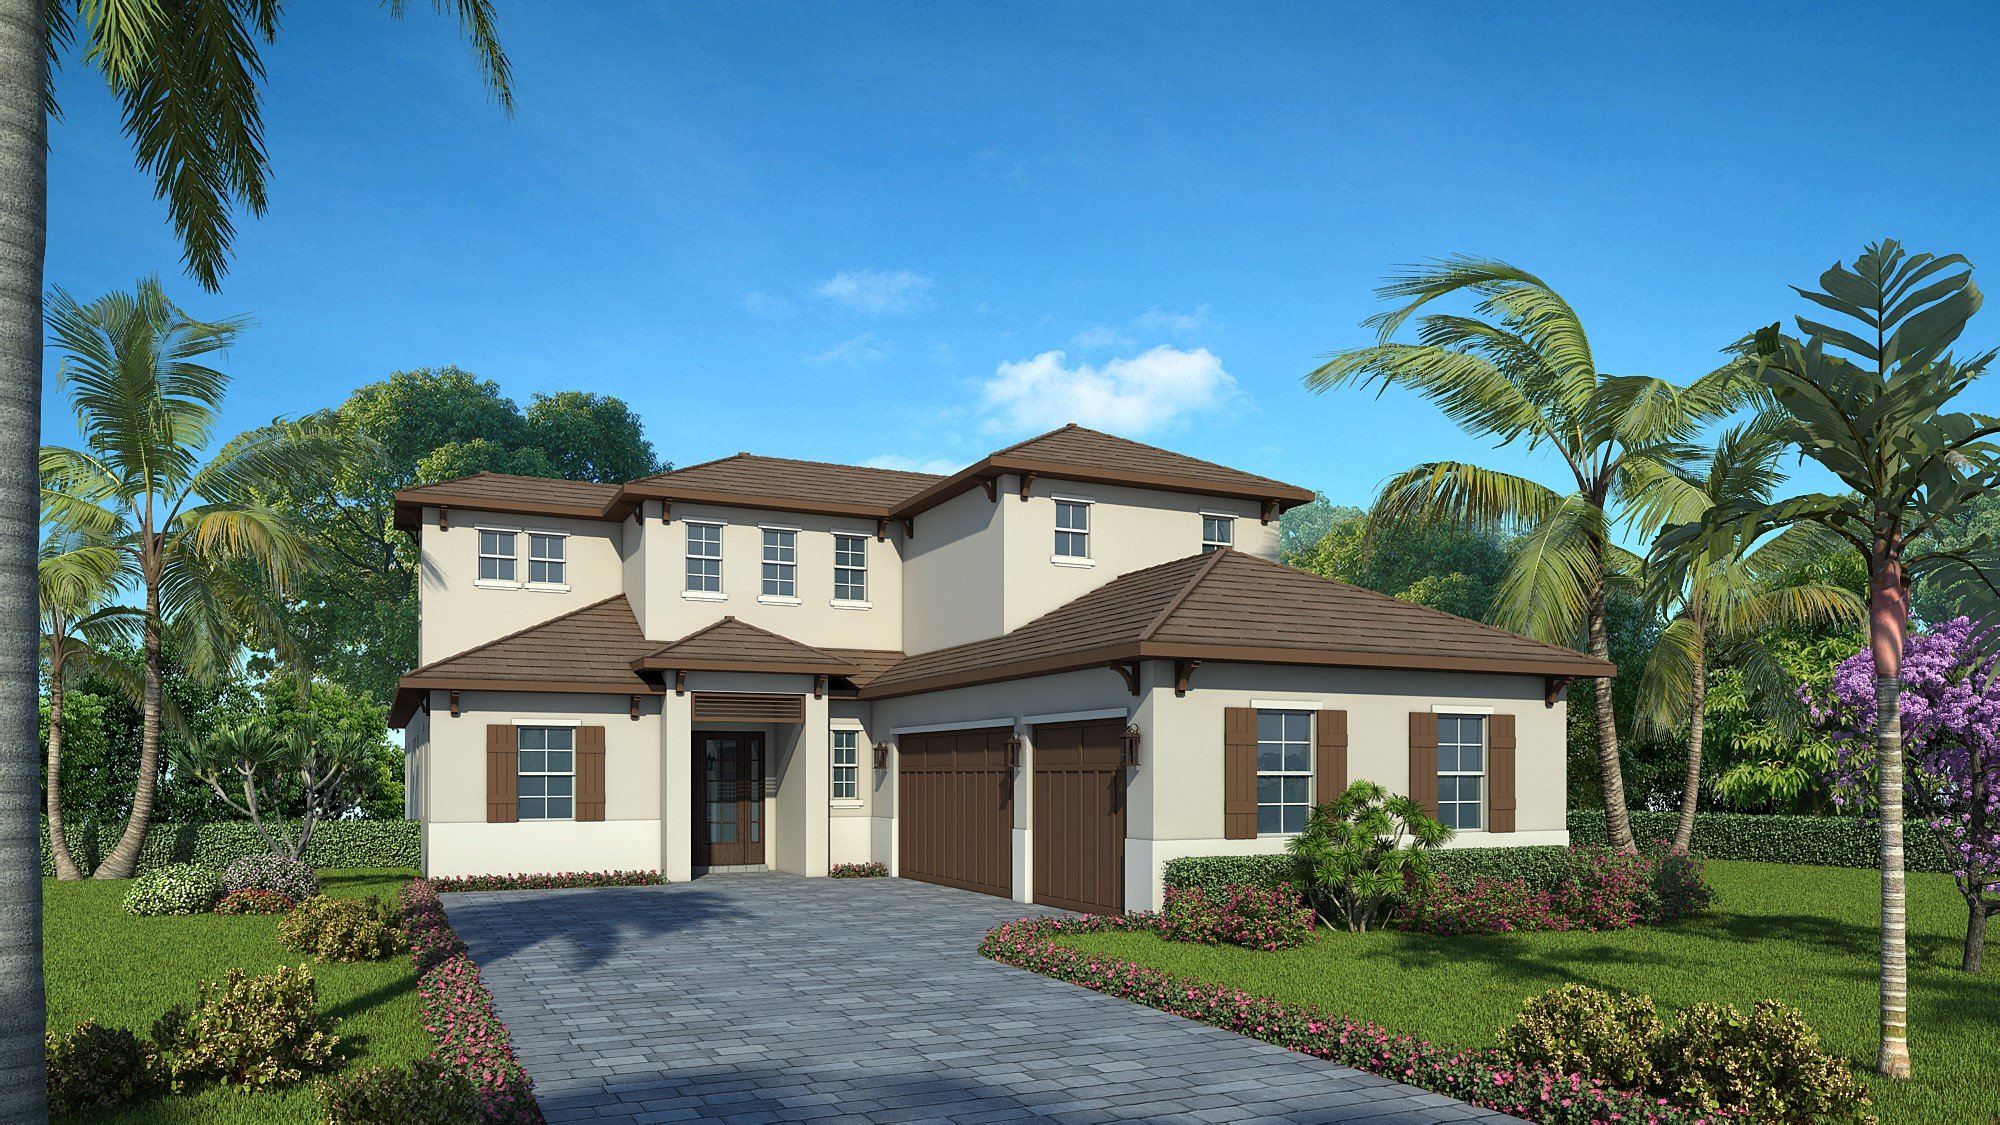 The Bermuda | 1614 Bay Road, Sarasota, FL 34231 $1,399,000 | 4 Bedrooms | 3 Full Bathrooms | 1 Half Bathroom | Study | Bonus Room | Pool and Spa